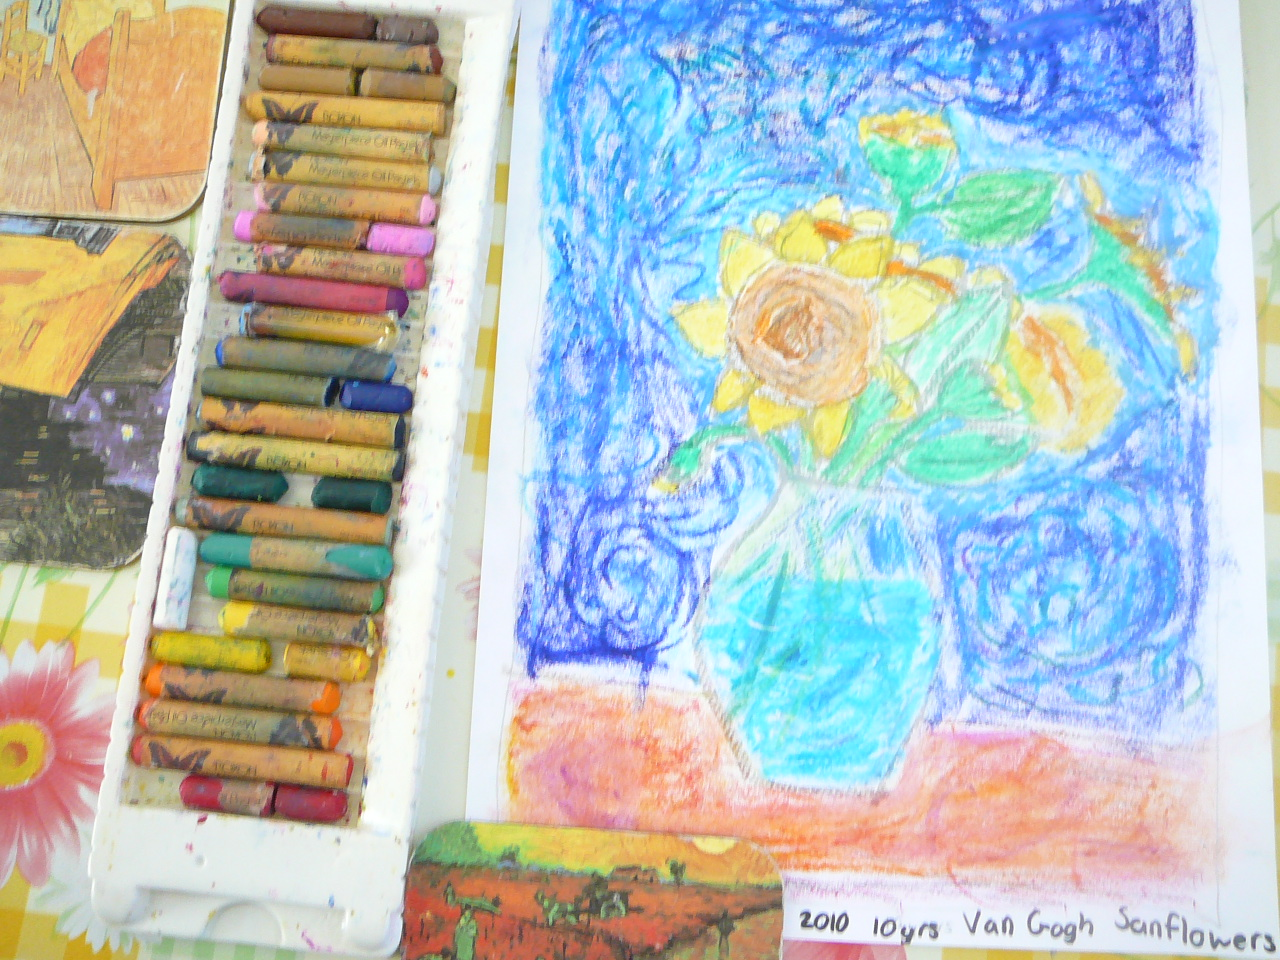 Van Gogh S Sunflowers Art Appreciation Lesson